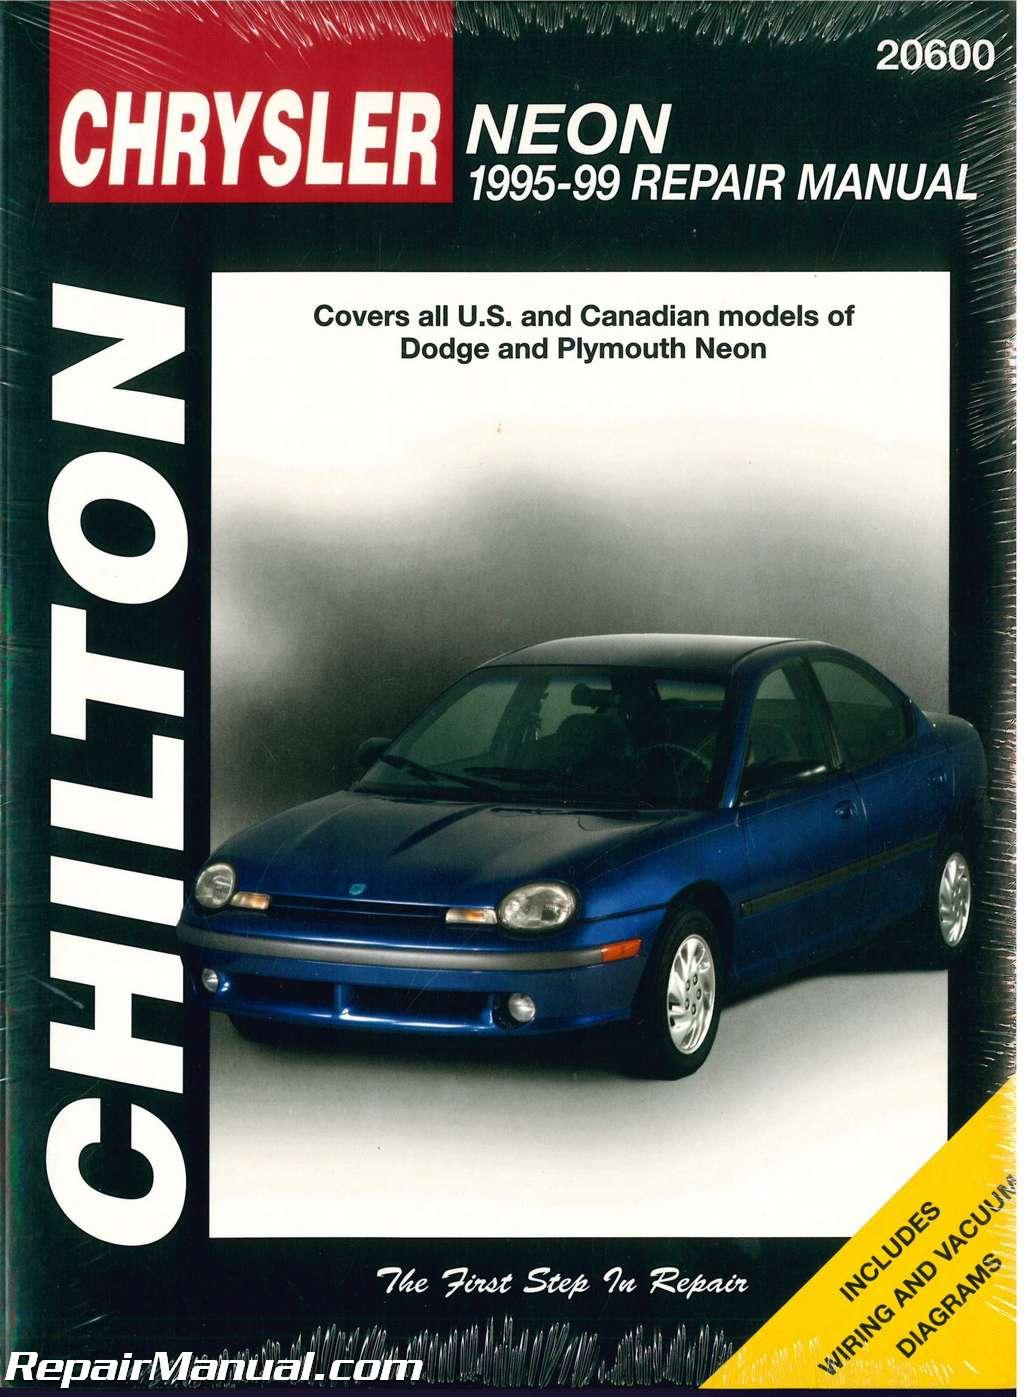 chilton vs haynes manual